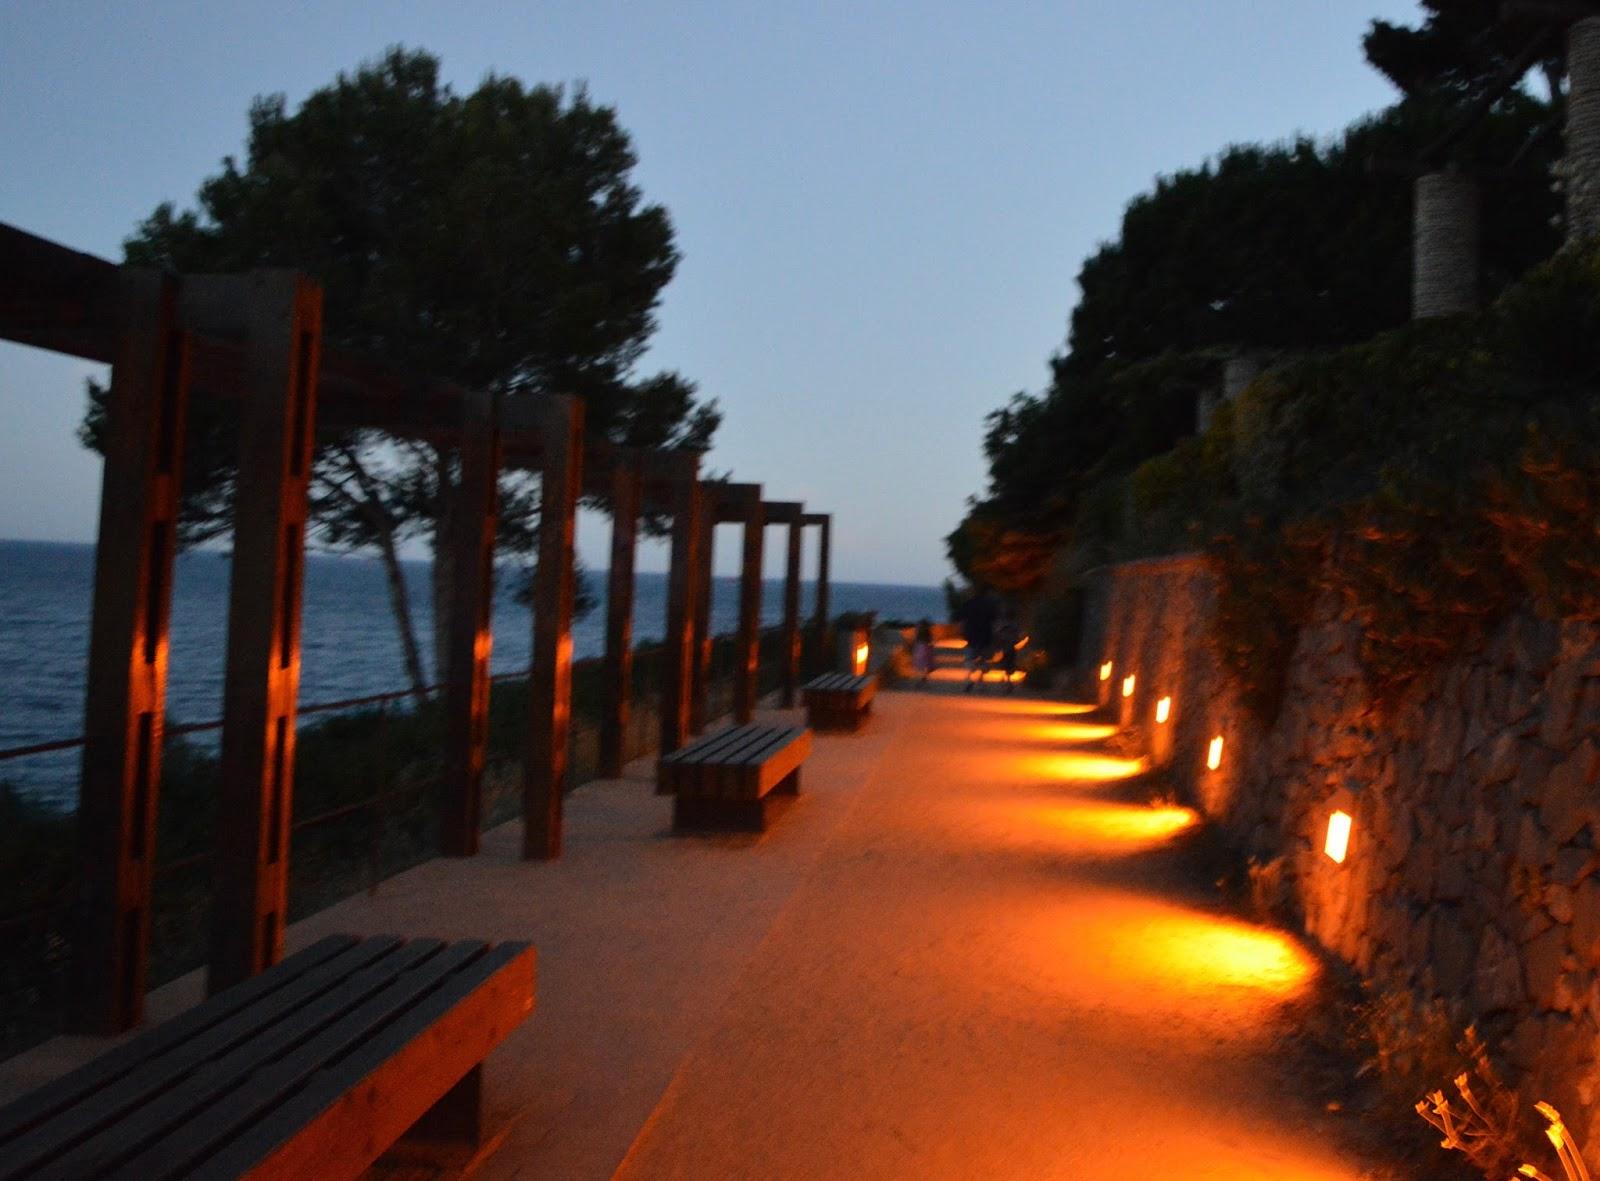 A walk from Calella de Palafrugell to Llafranc - Calella at night